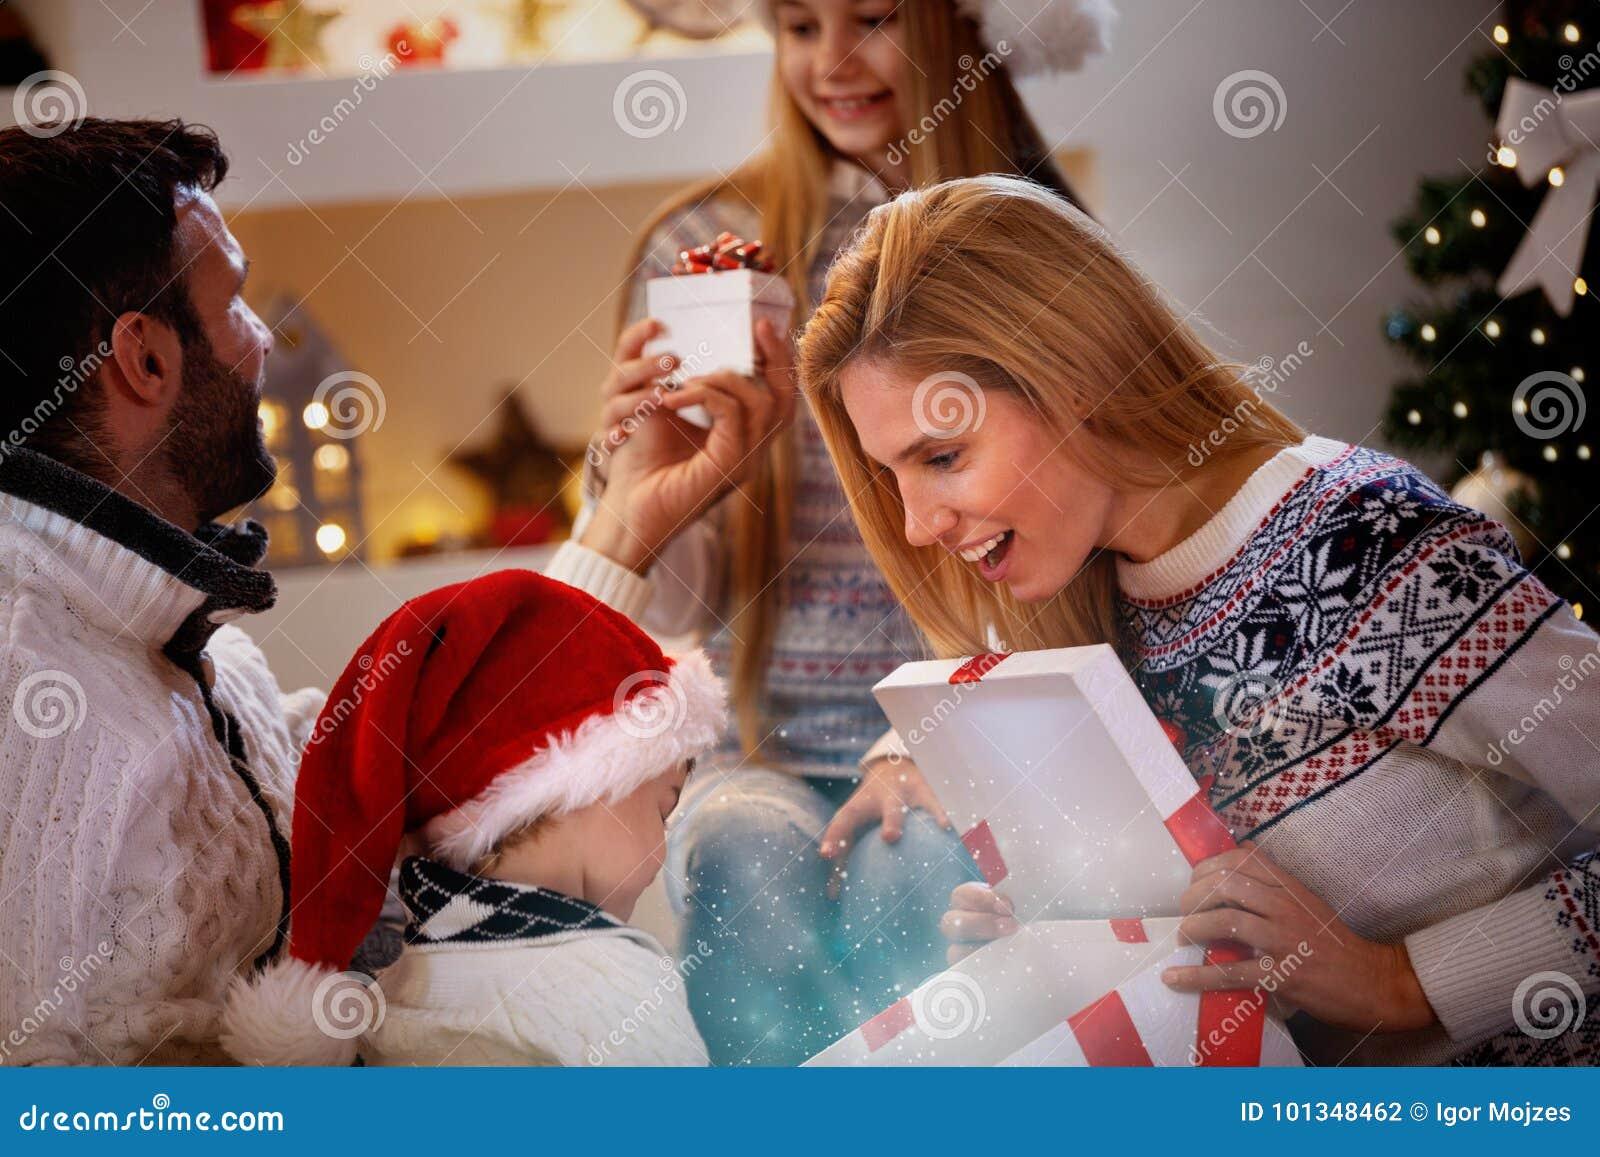 Magical Christmas - family enjoying in Christmas present